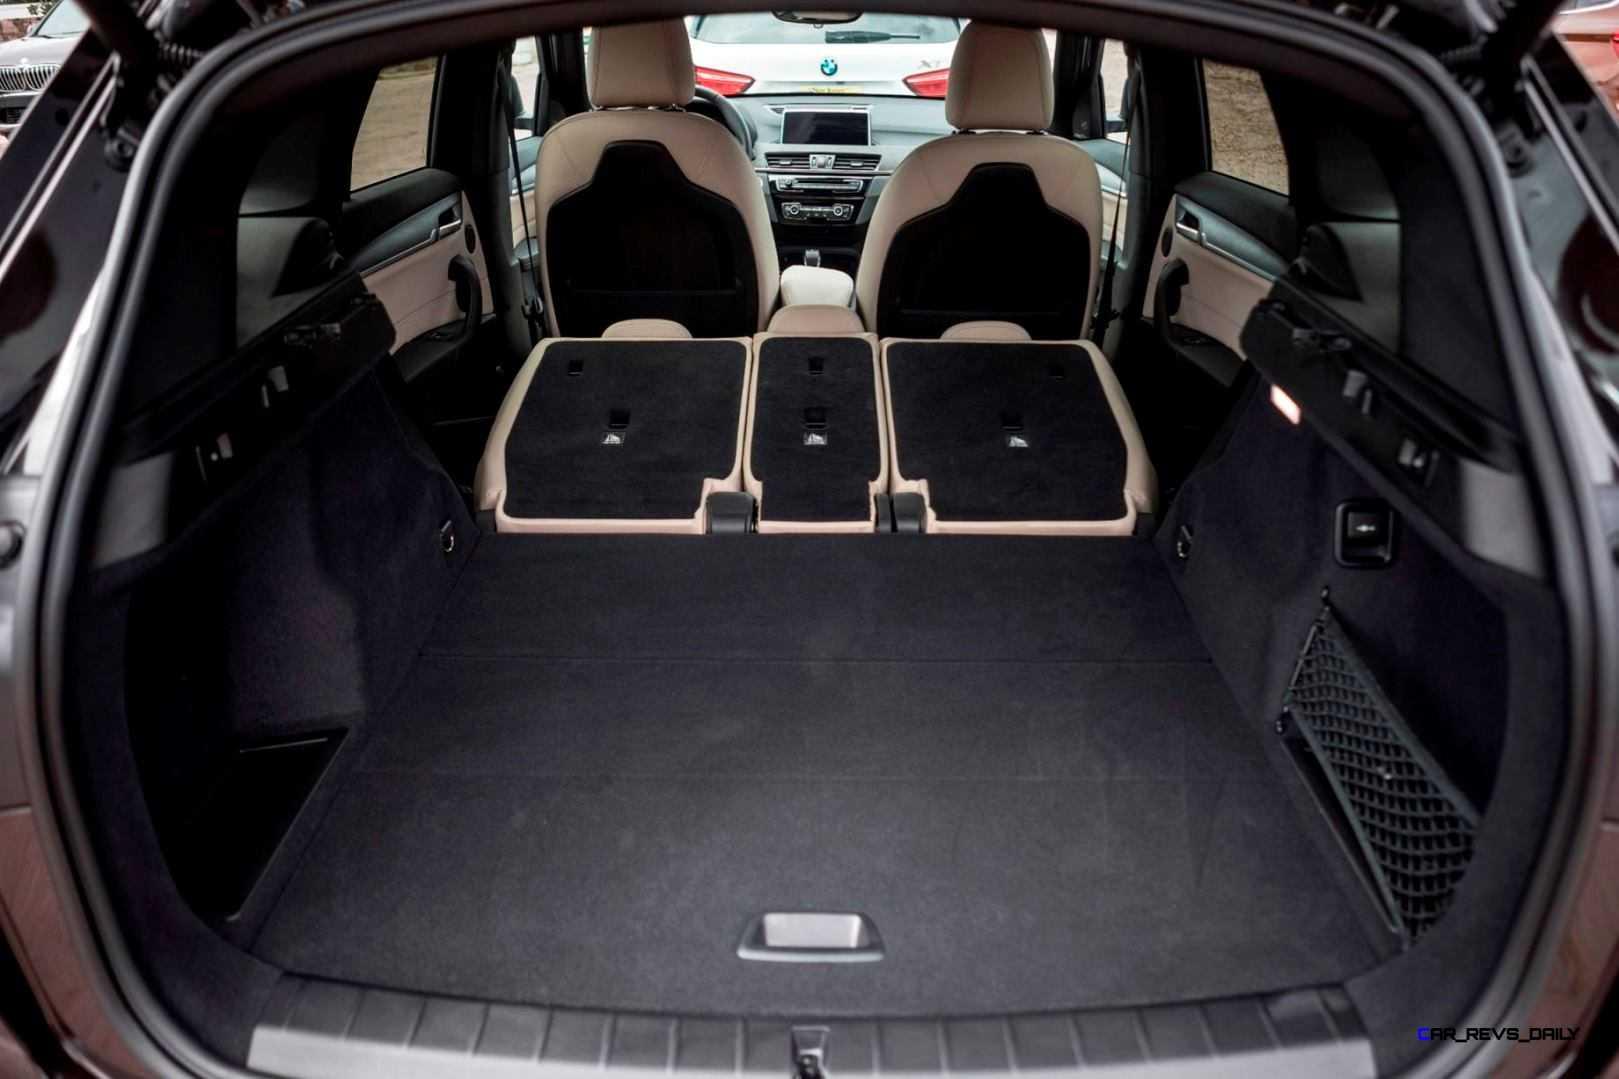 2016 bmw x1 xdrive28i interior 14. Black Bedroom Furniture Sets. Home Design Ideas